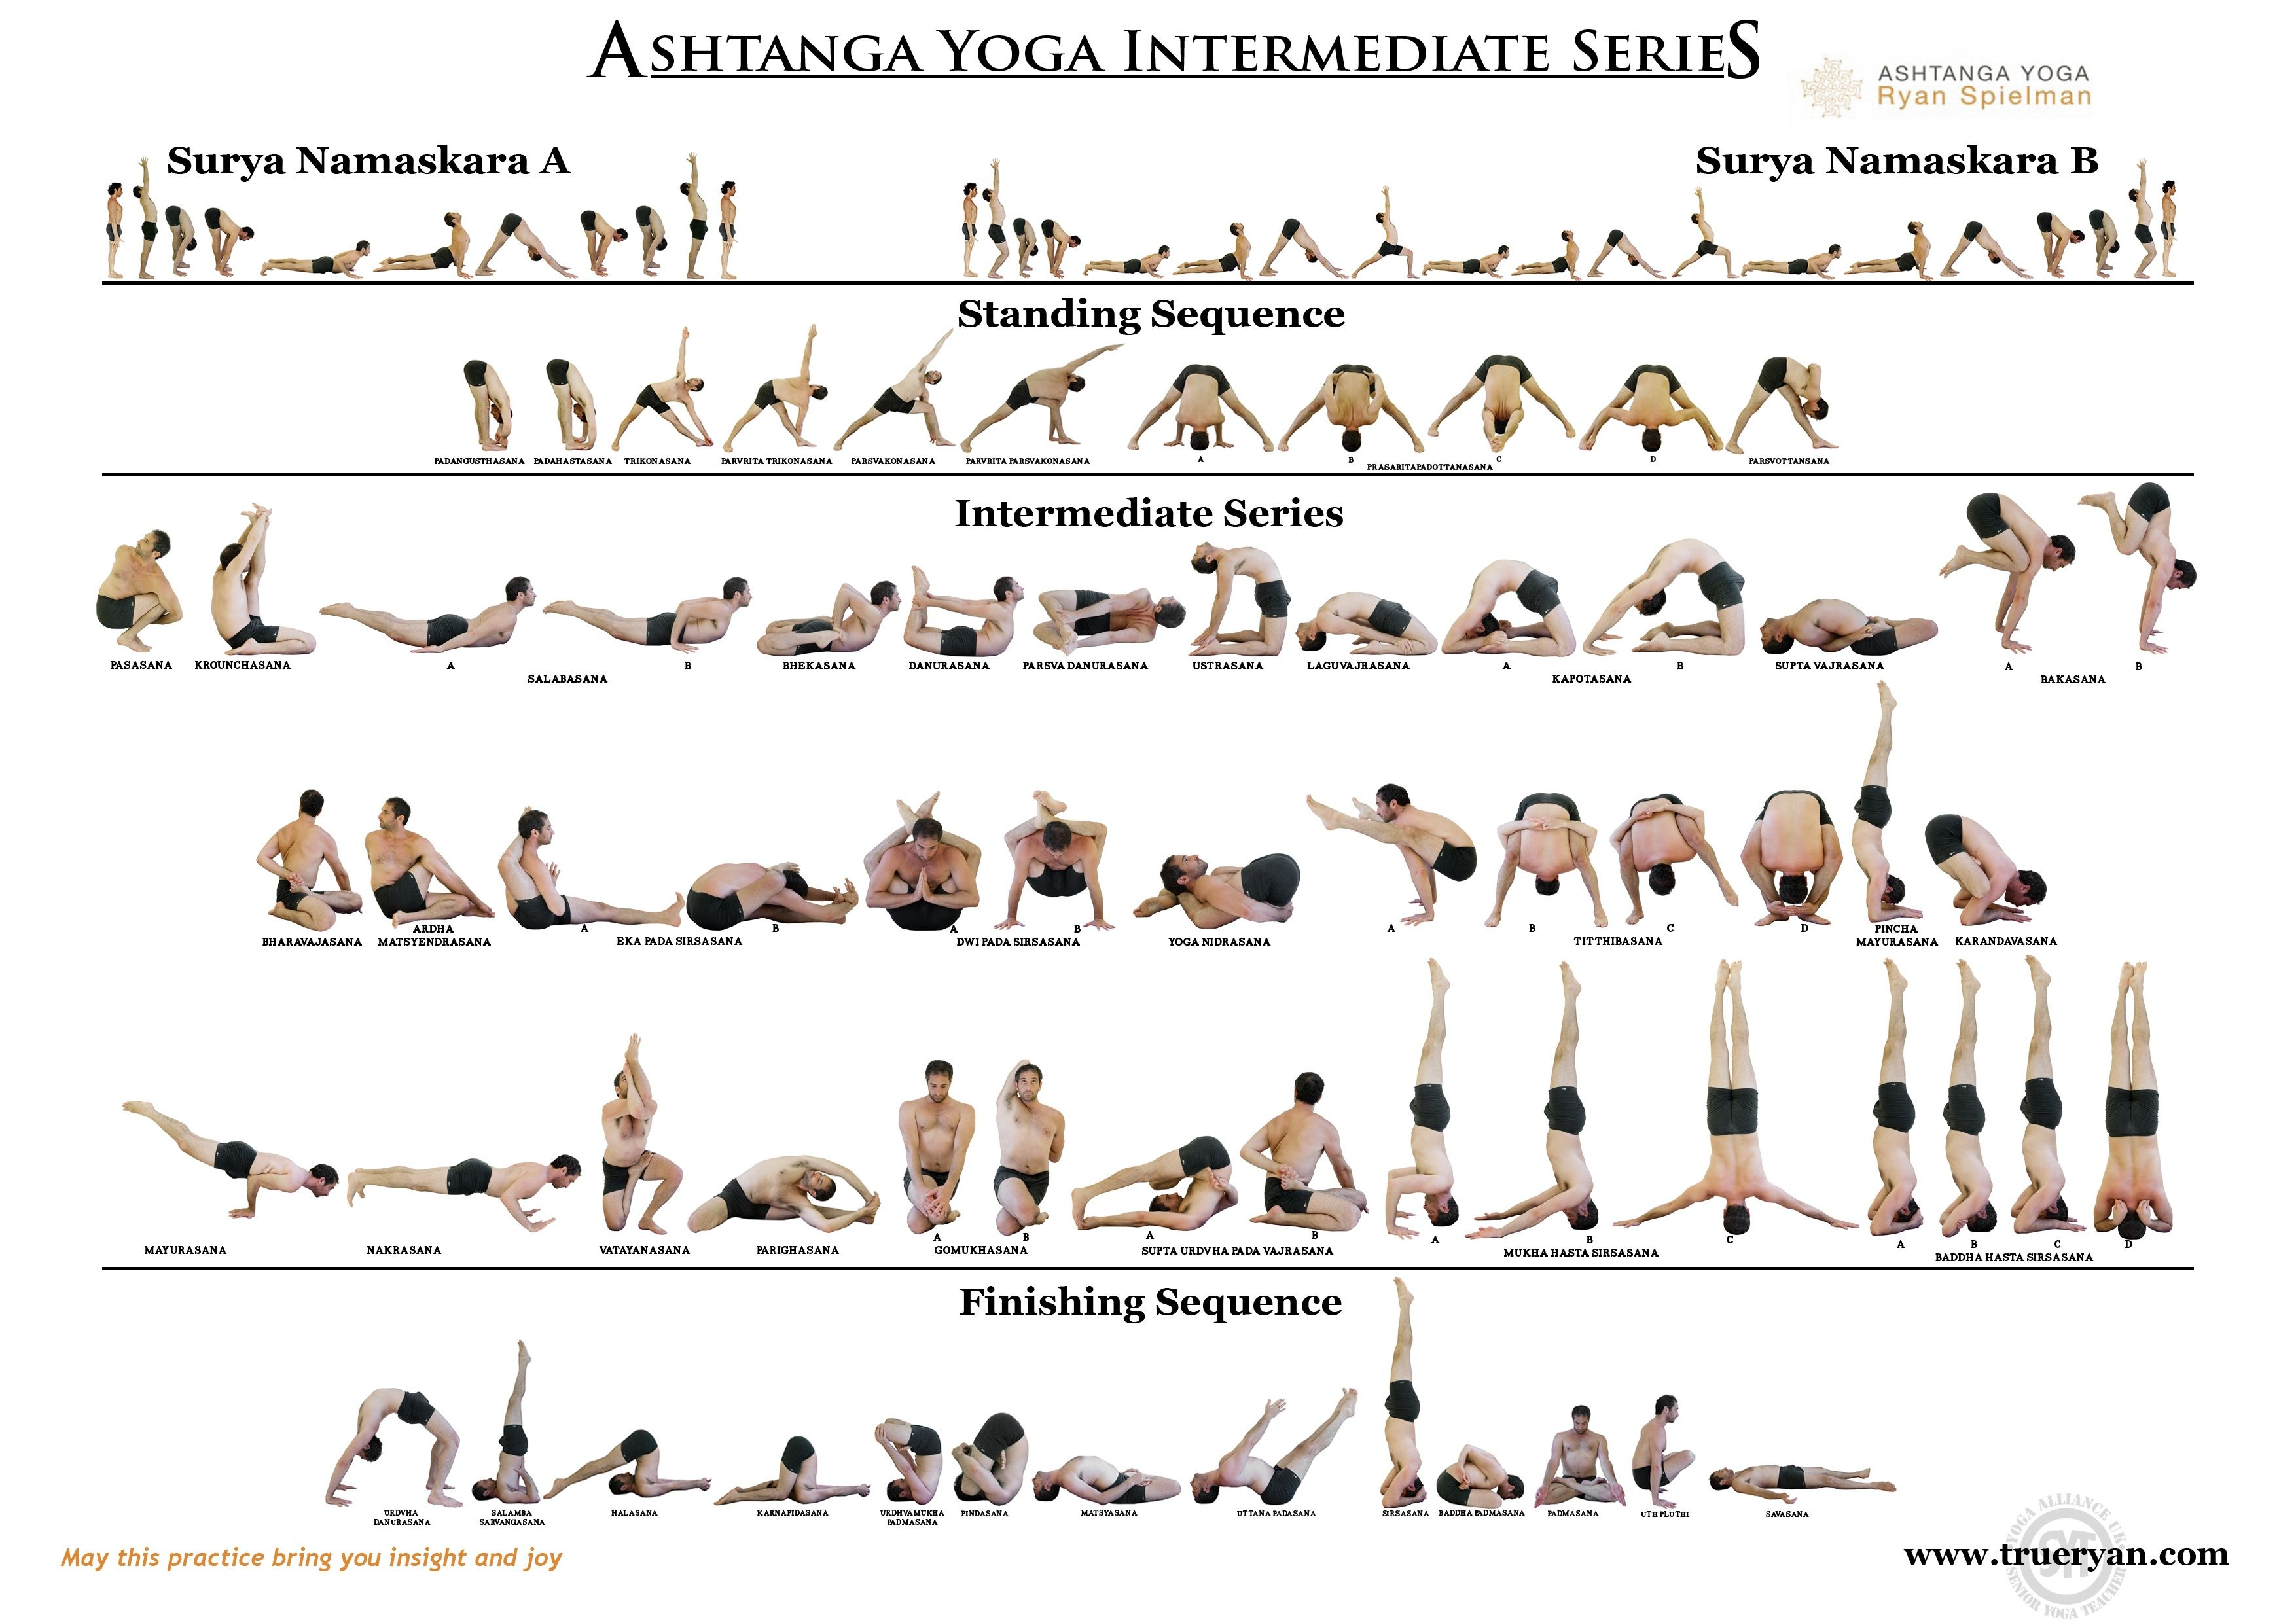 Ashtanga Primary Series Ashtanga Vinyasa Yoga Ashtanga Yoga Vinyasa Yoga